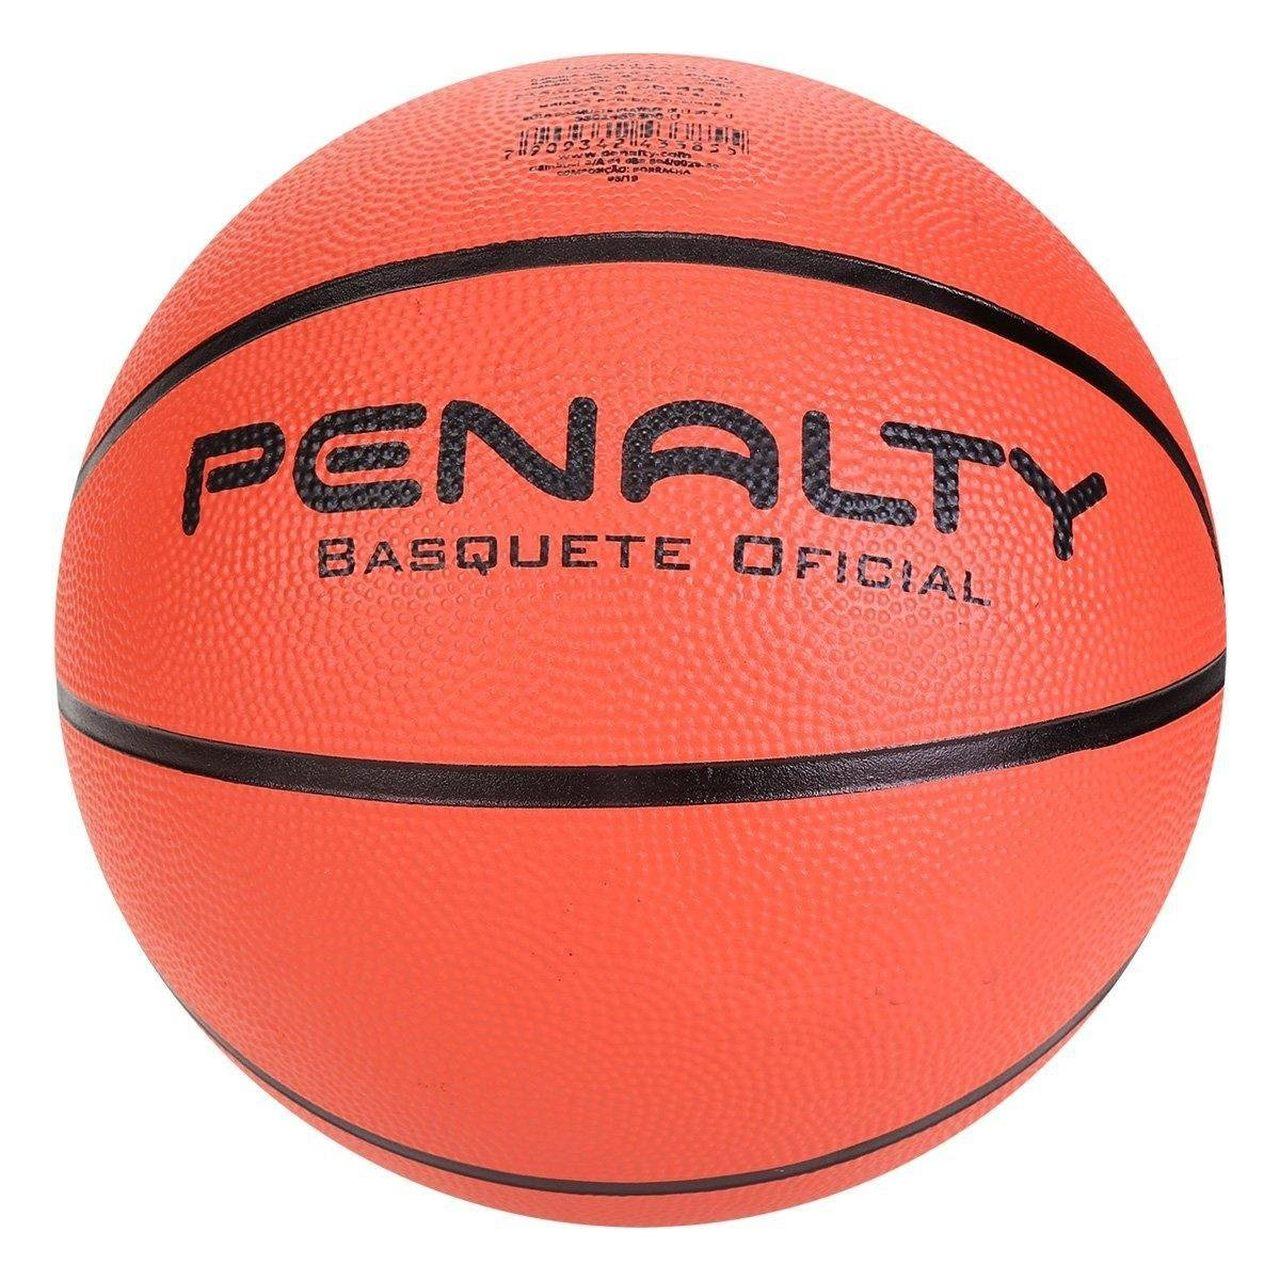 Bola De Basquete Playoff IX Laranja - Penalty